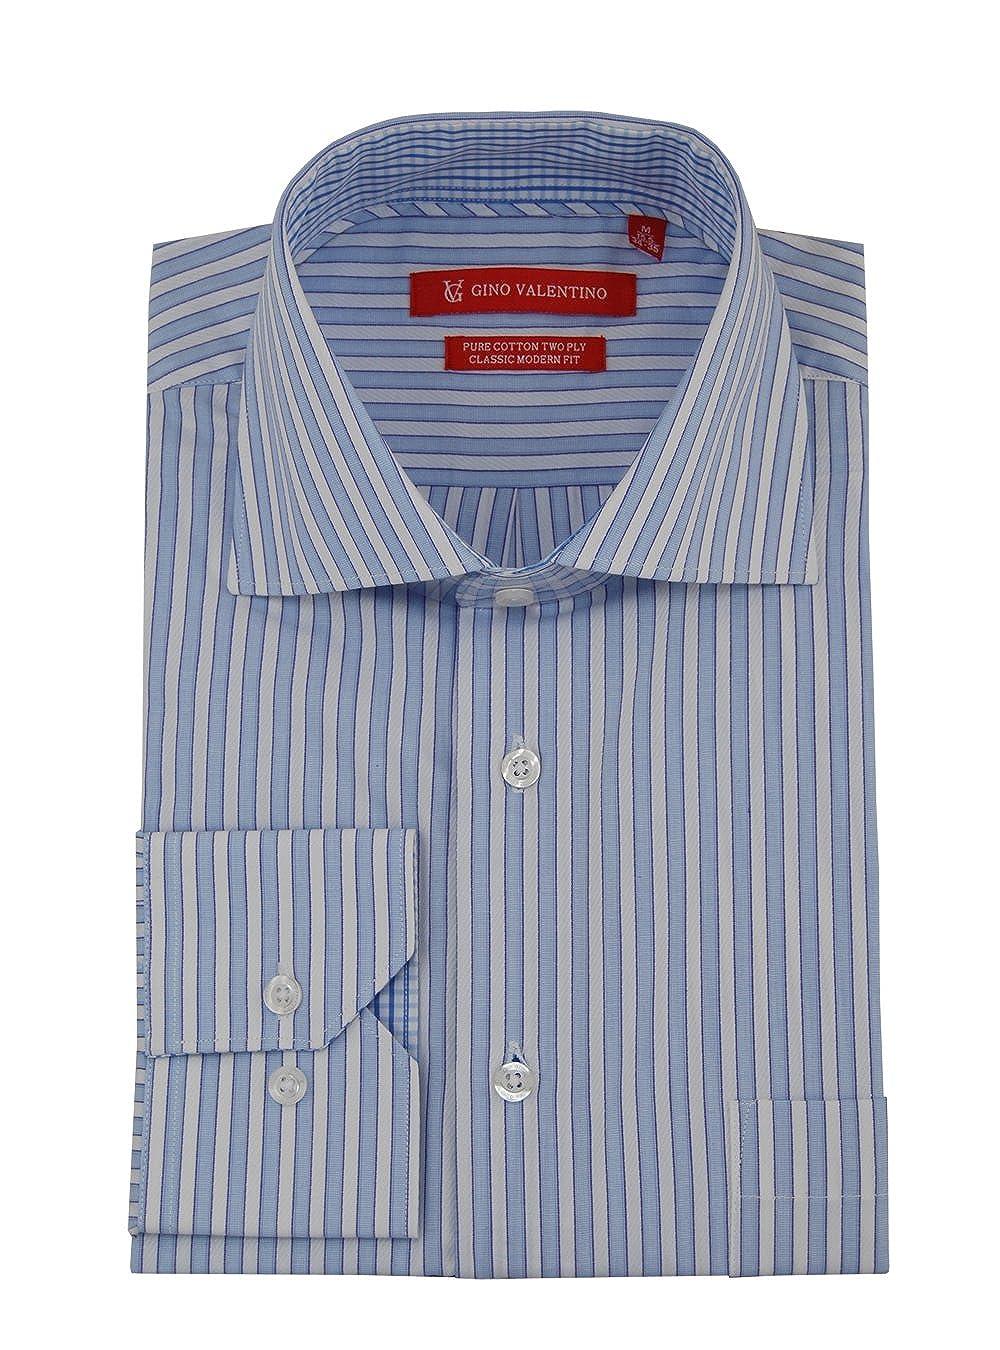 Gino Valentino Mens Striped Dress Shirt Cotton Spread Collar Barrel